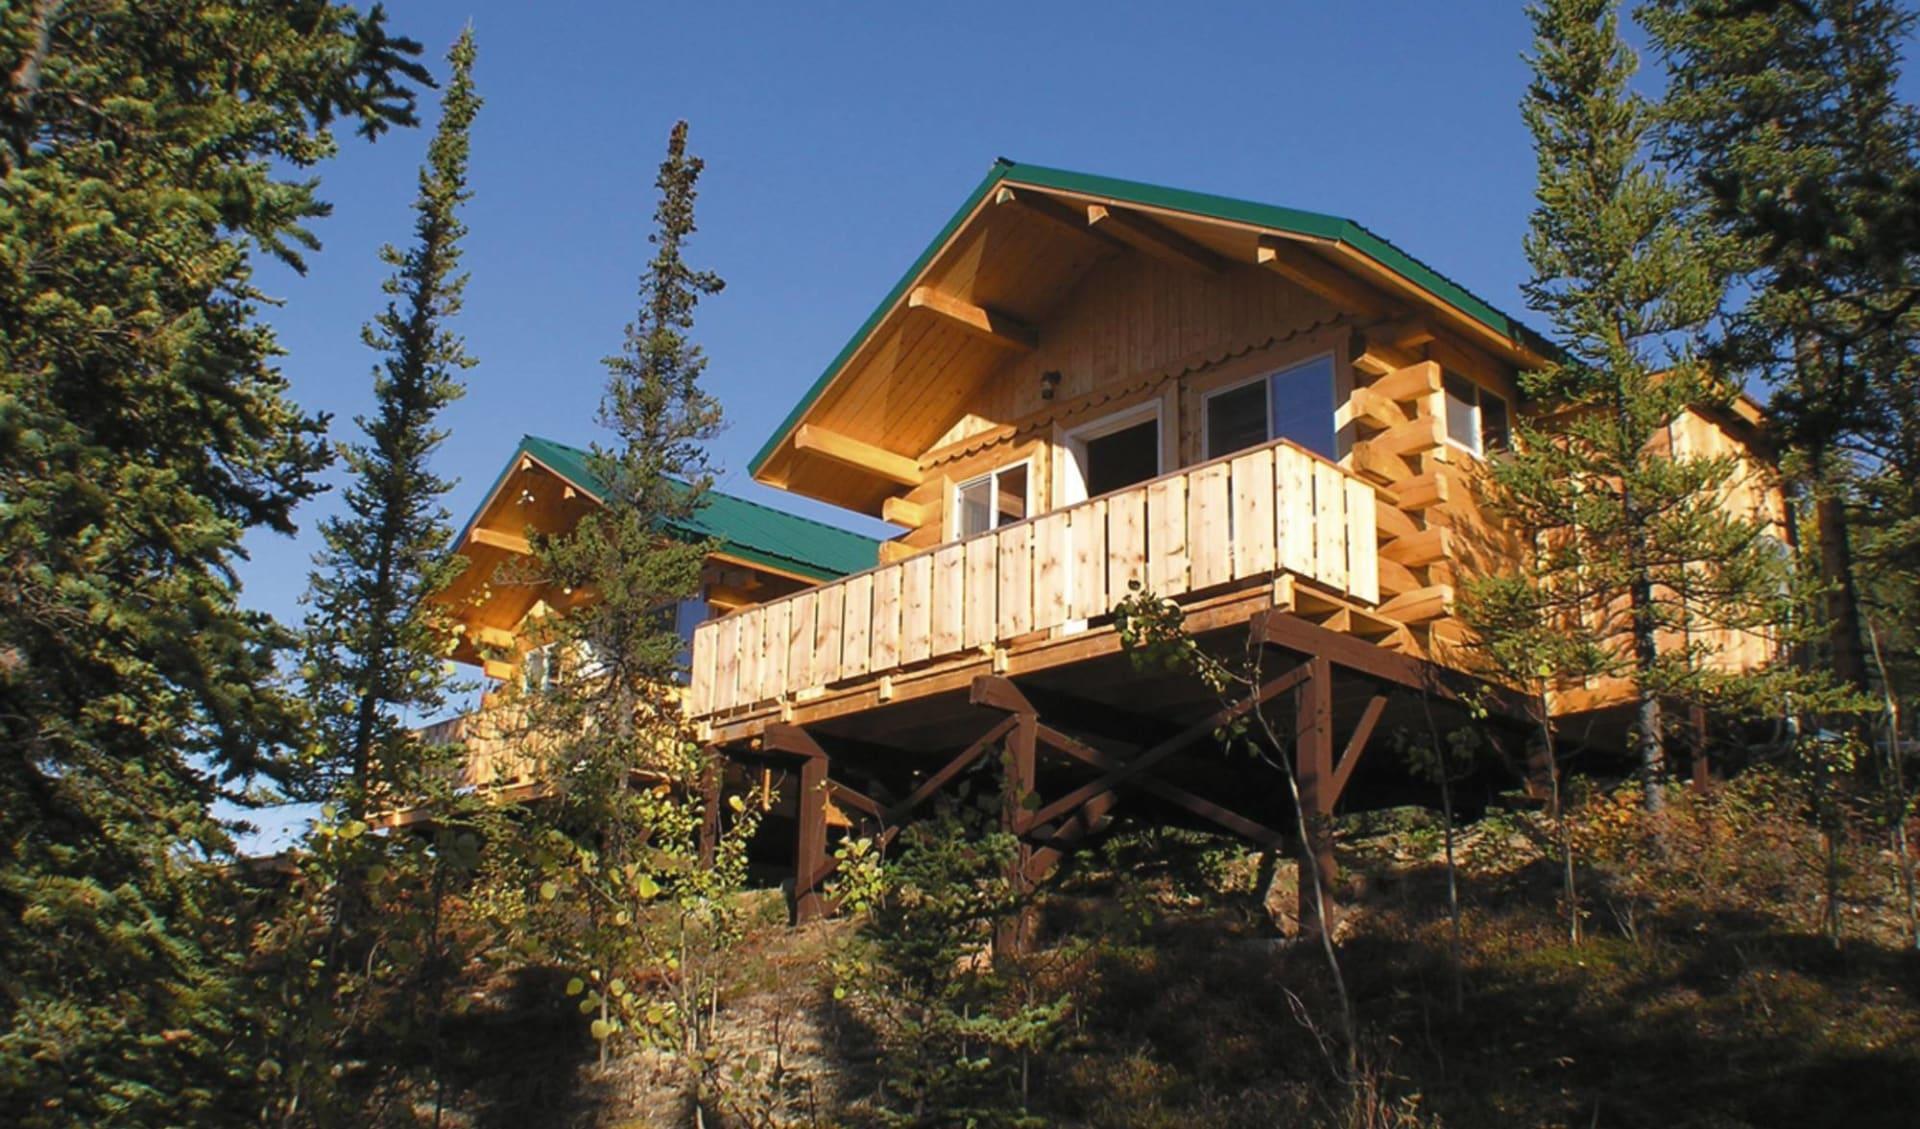 Denali Grizzly Bear Resort in Denali National Park: _ exterior Denali Grizzly Bear Resort - Aussenansicht Cabins